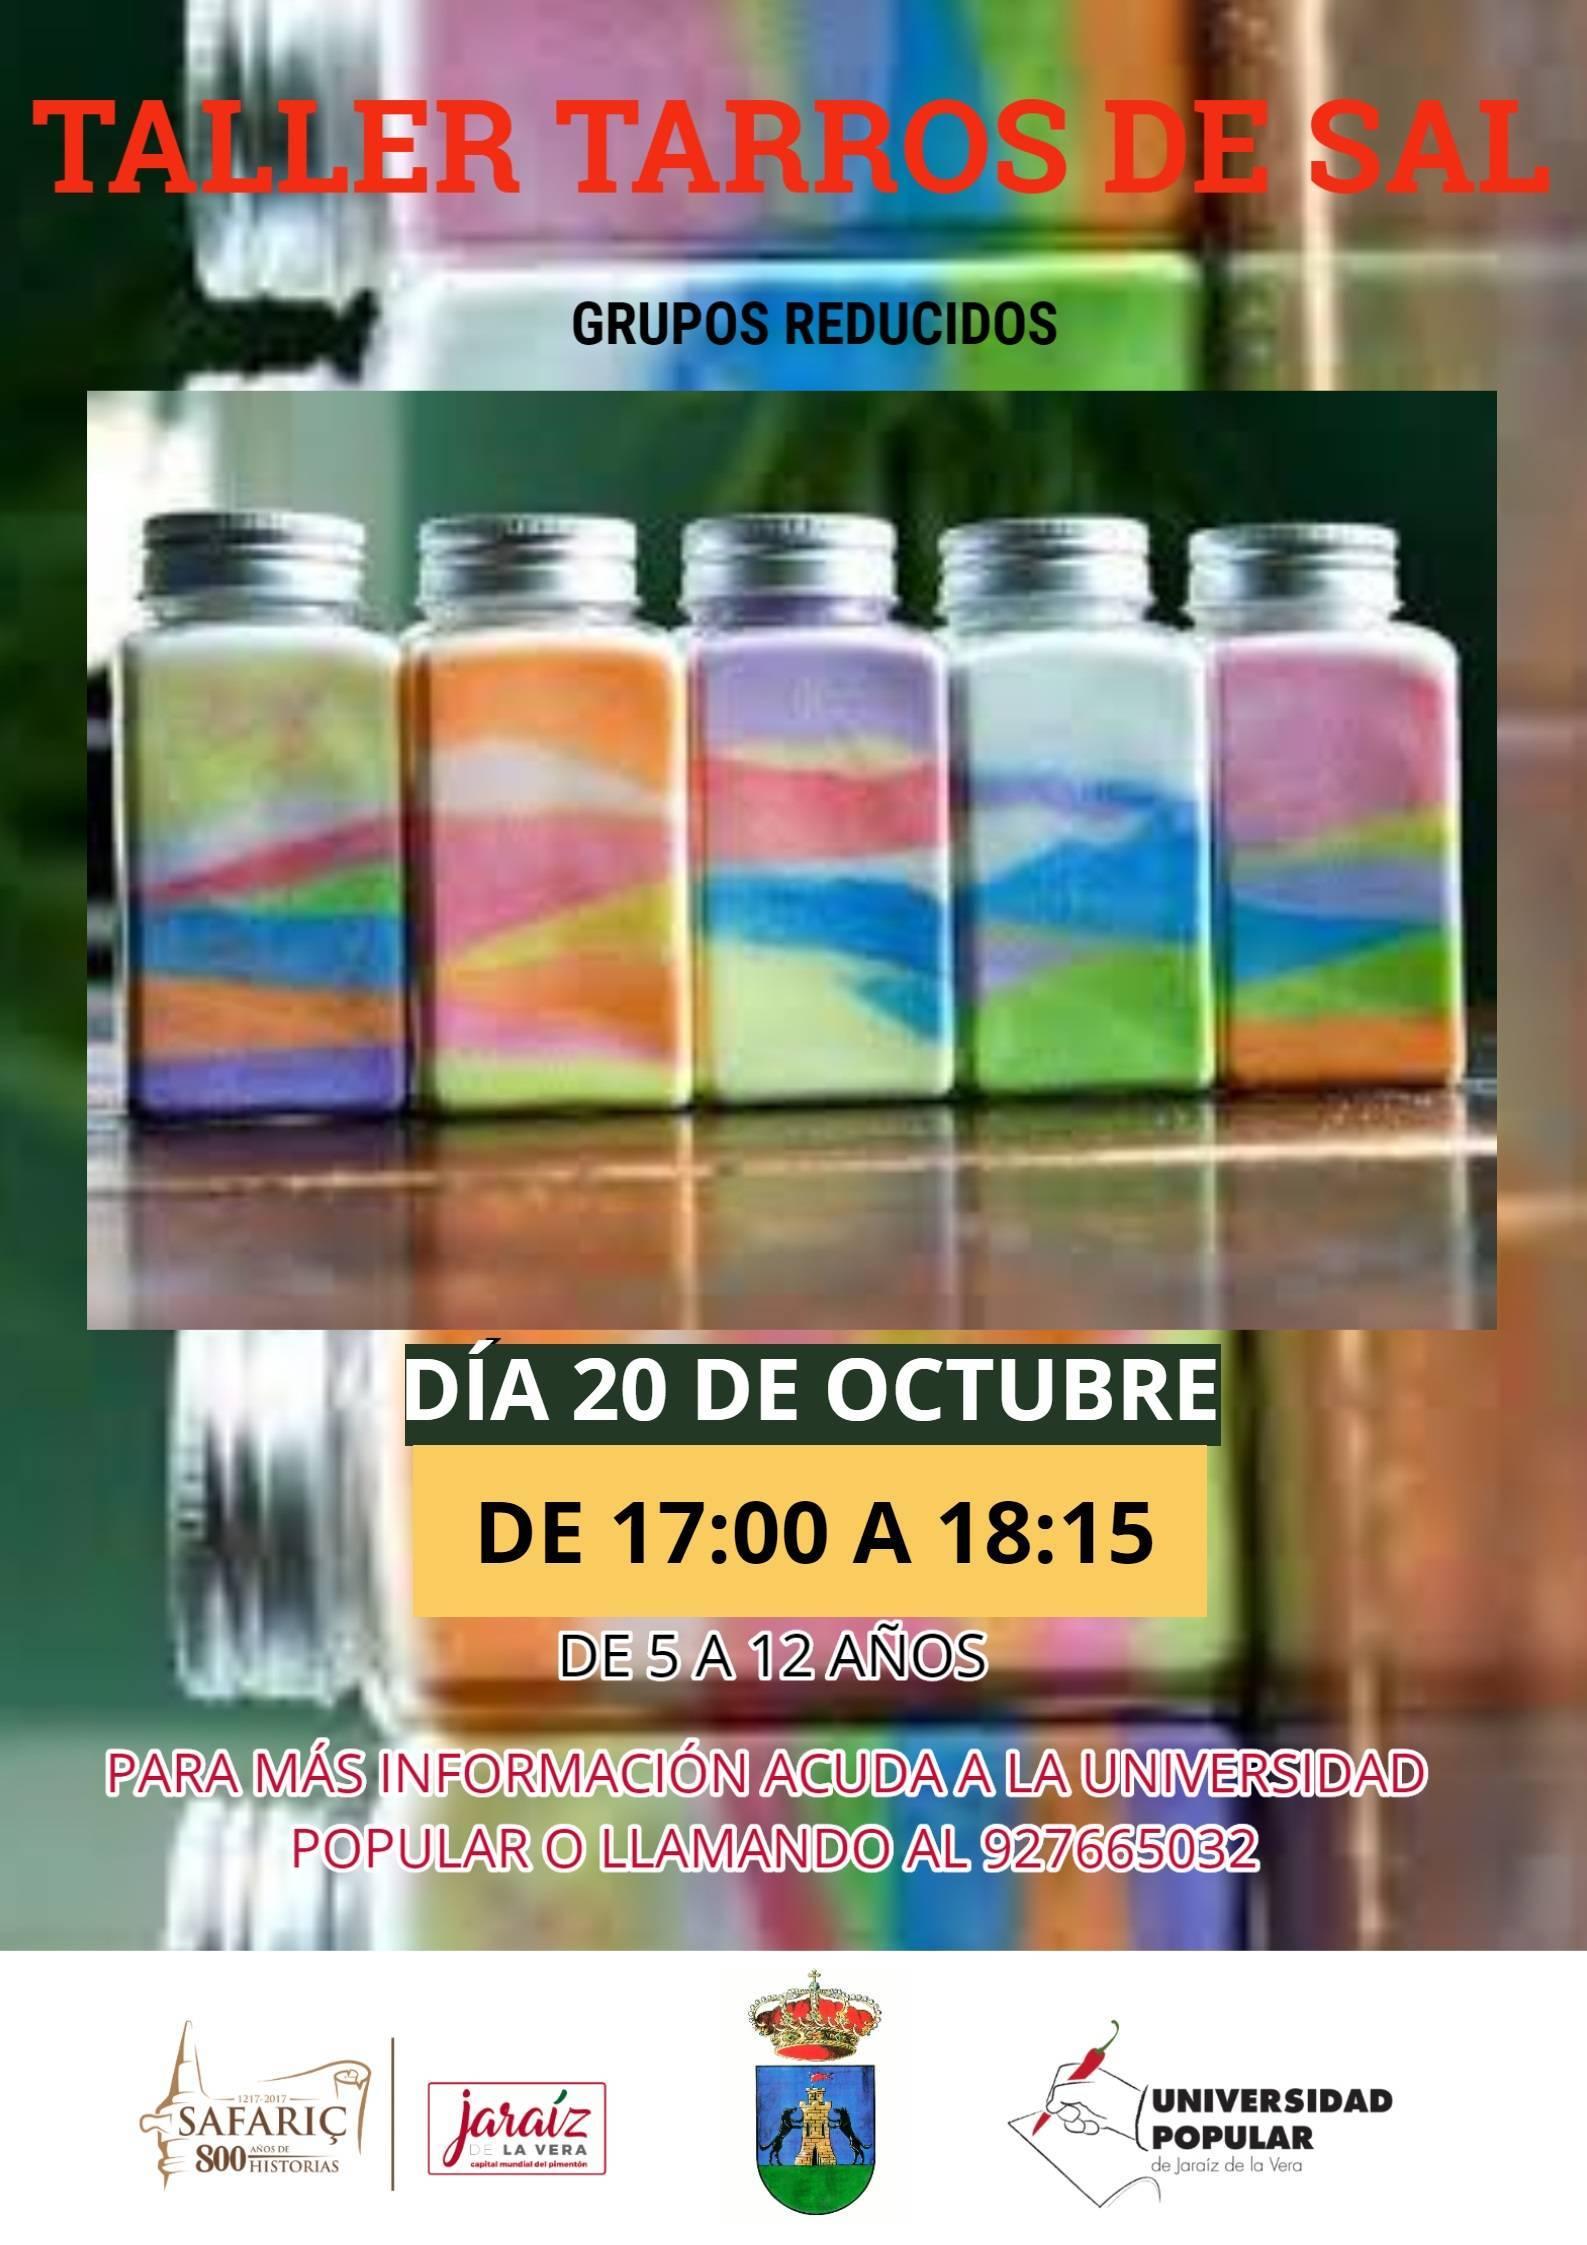 Taller de tarros de sal (2020) - Jaraíz de la Vera (Cáceres)